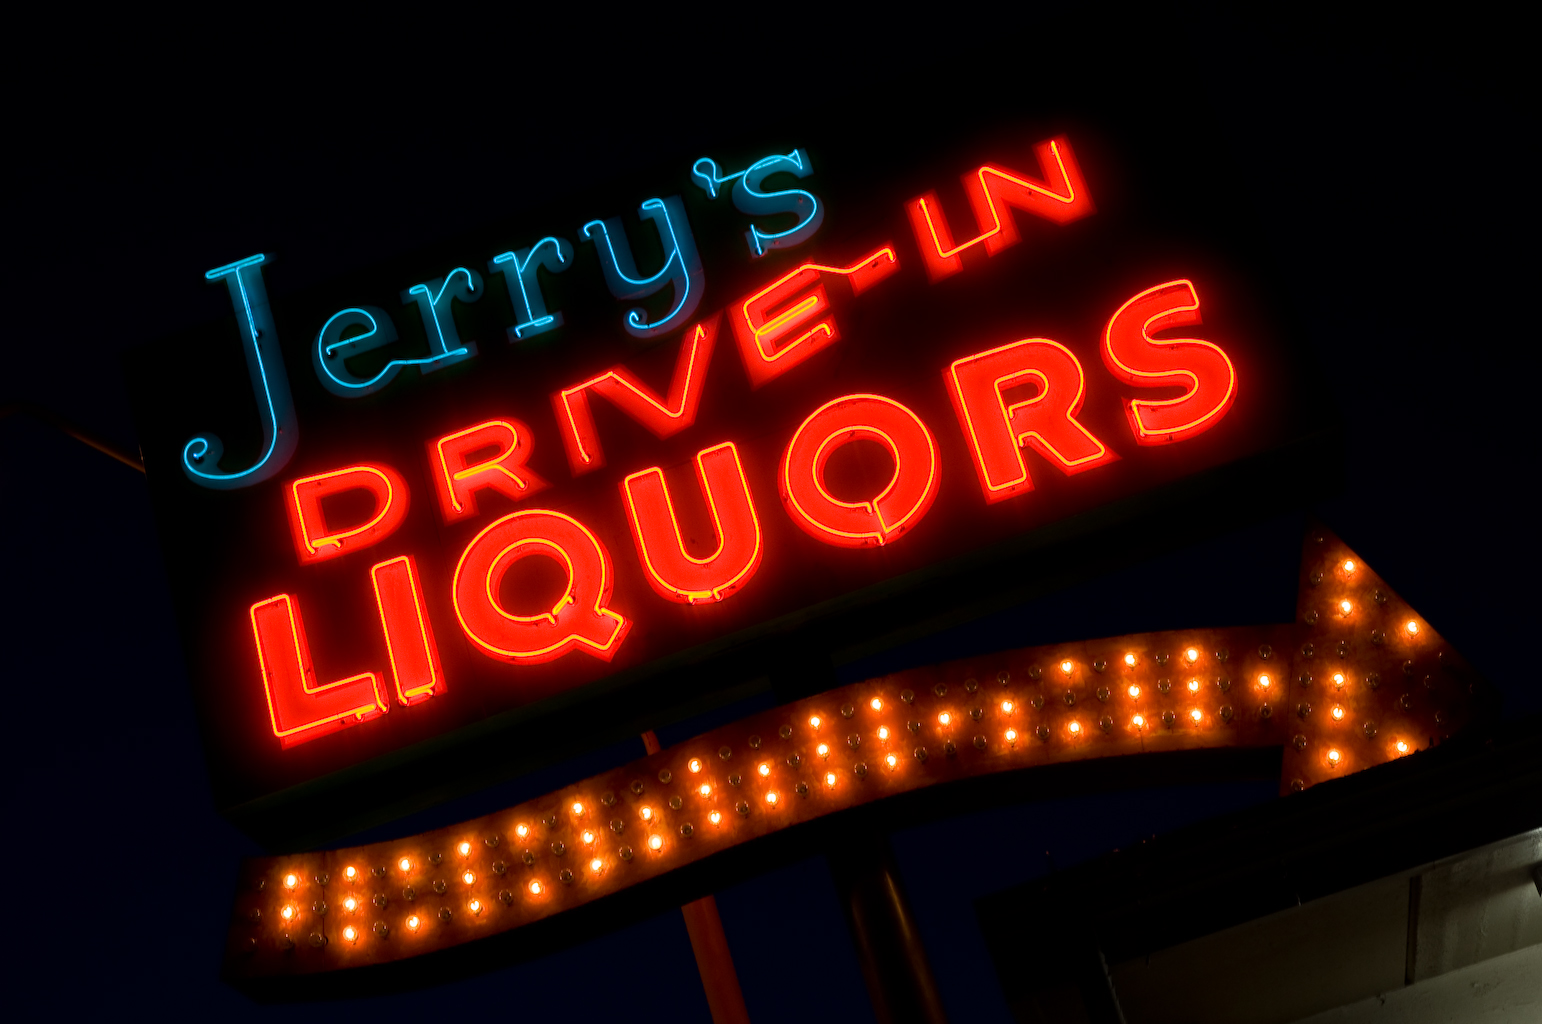 Jerry's Drive-In Liquors - 1217 South Rural Road, Tempe, Arizona U.S.A. - June 7, 2011